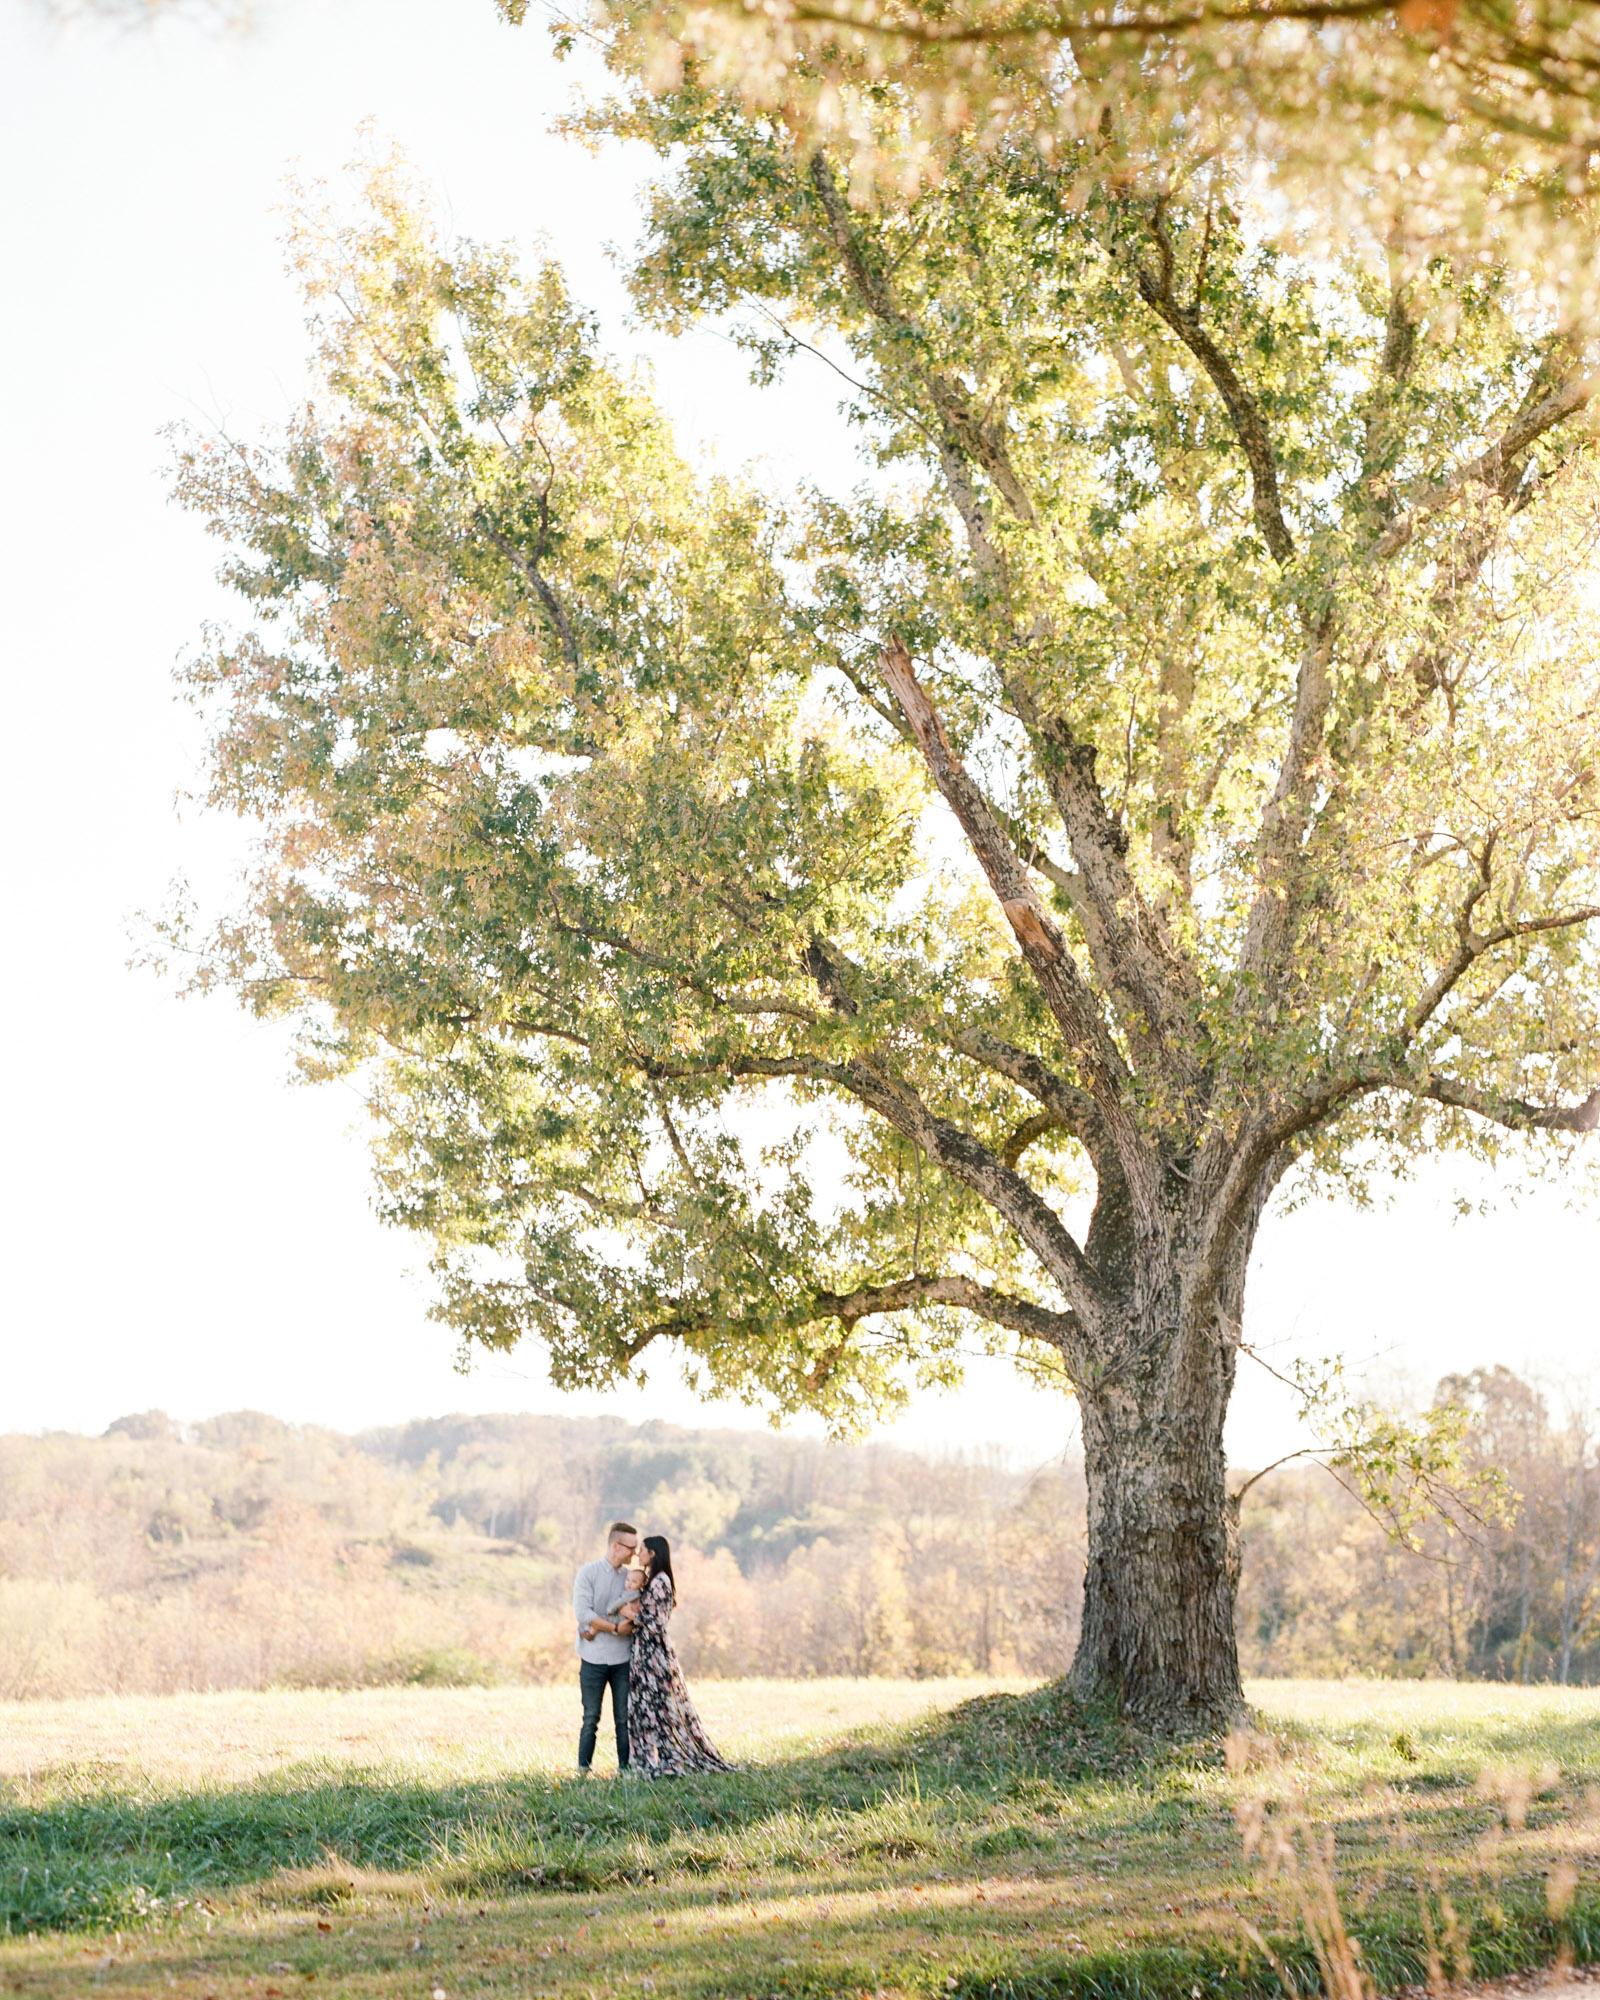 Charlottesville_Charlotte_North_Carolina_Richmond_Virginia_Family_Wedding_Film_Photographer-45.jpg